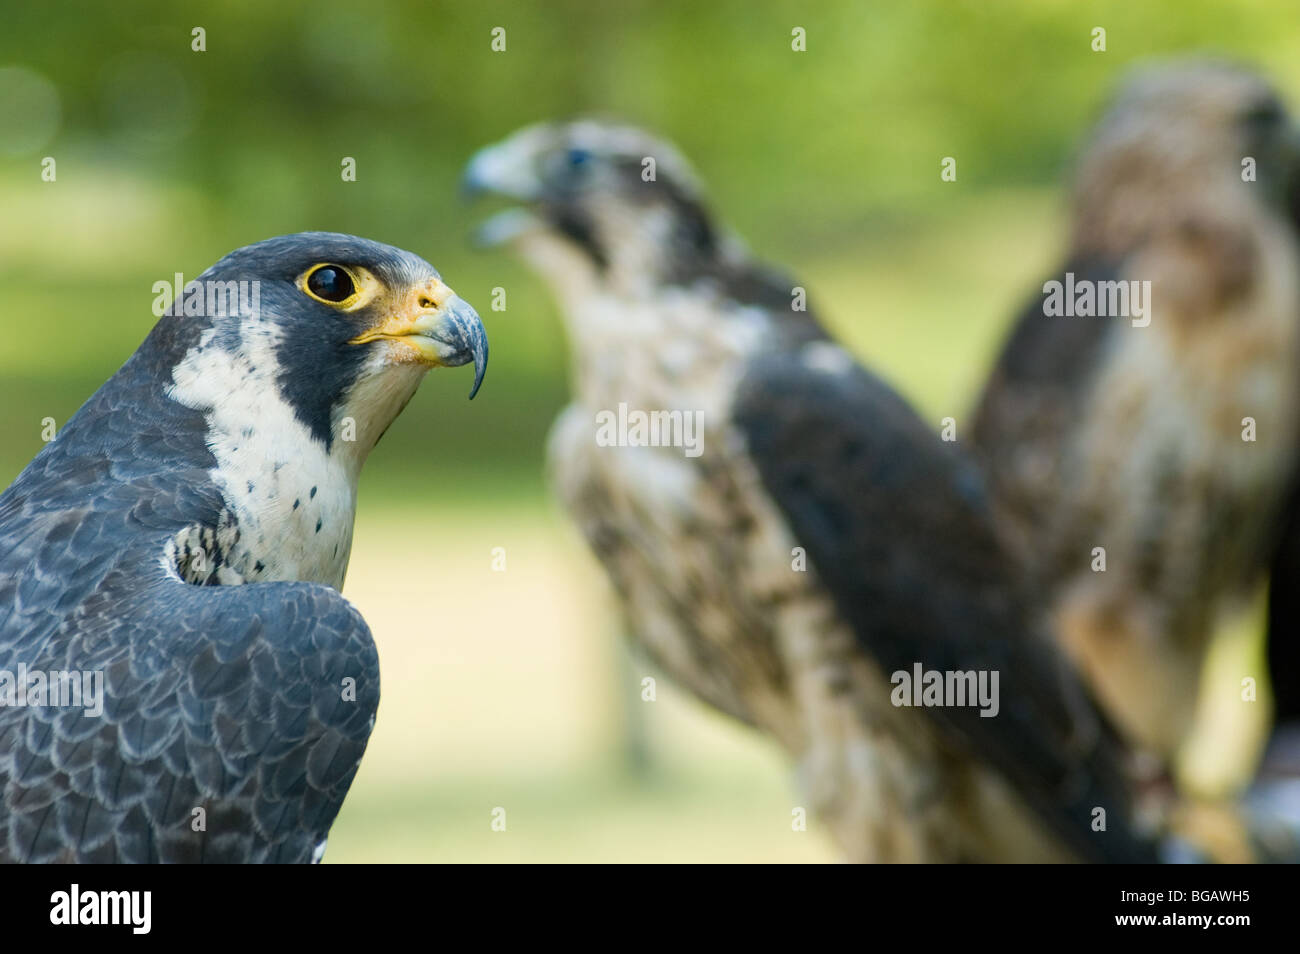 Birds Of Prey Marsh Hawk Ohiopyle Pennsylvania Stock Photo 27284465